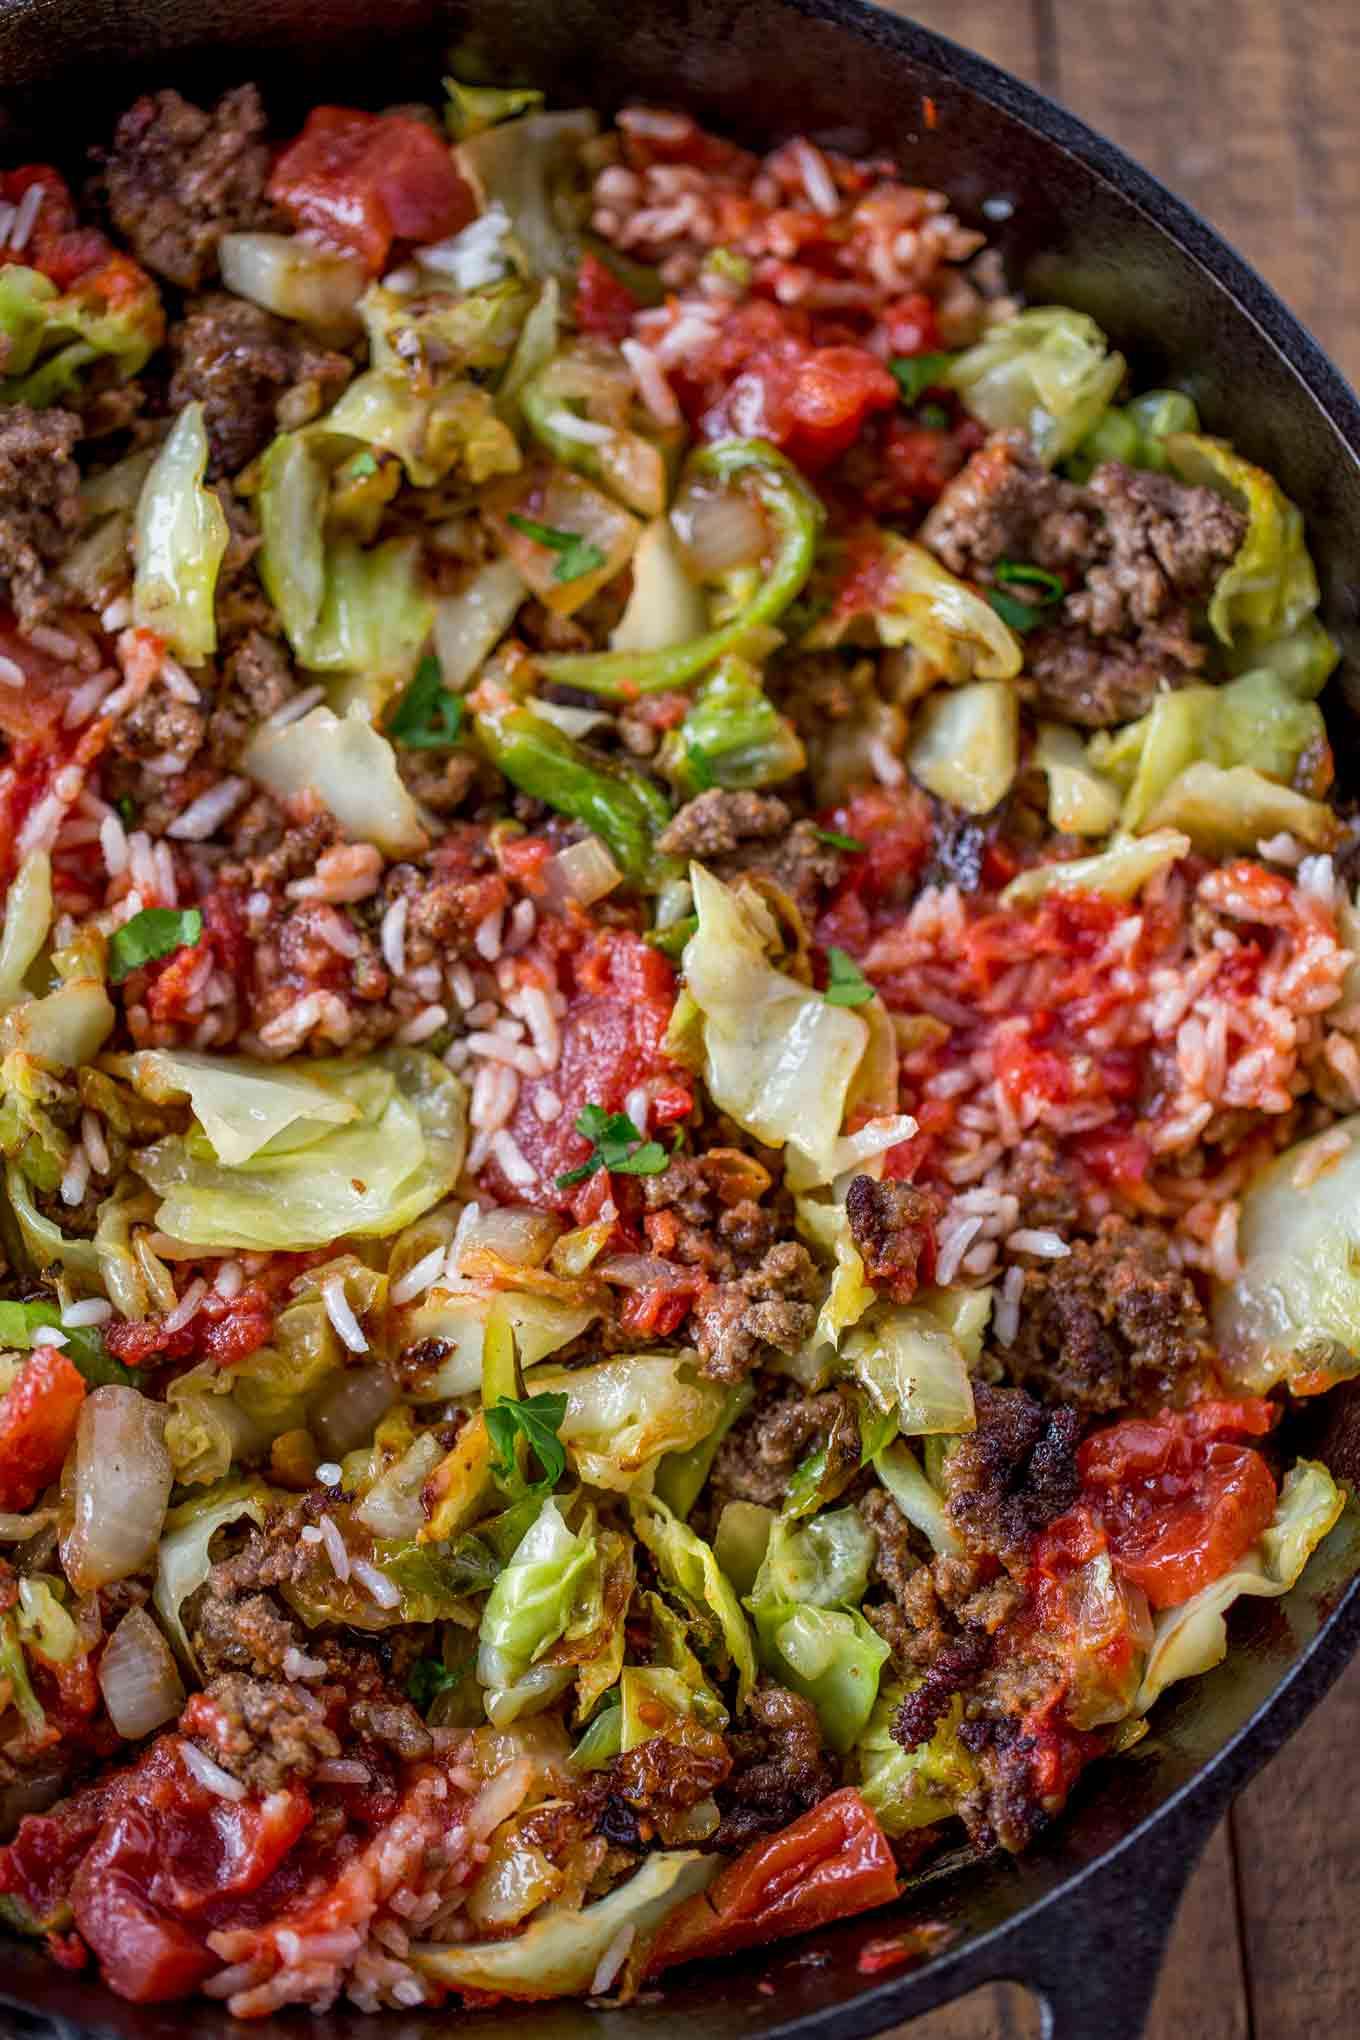 Skillet of stuffed cabbage casserole